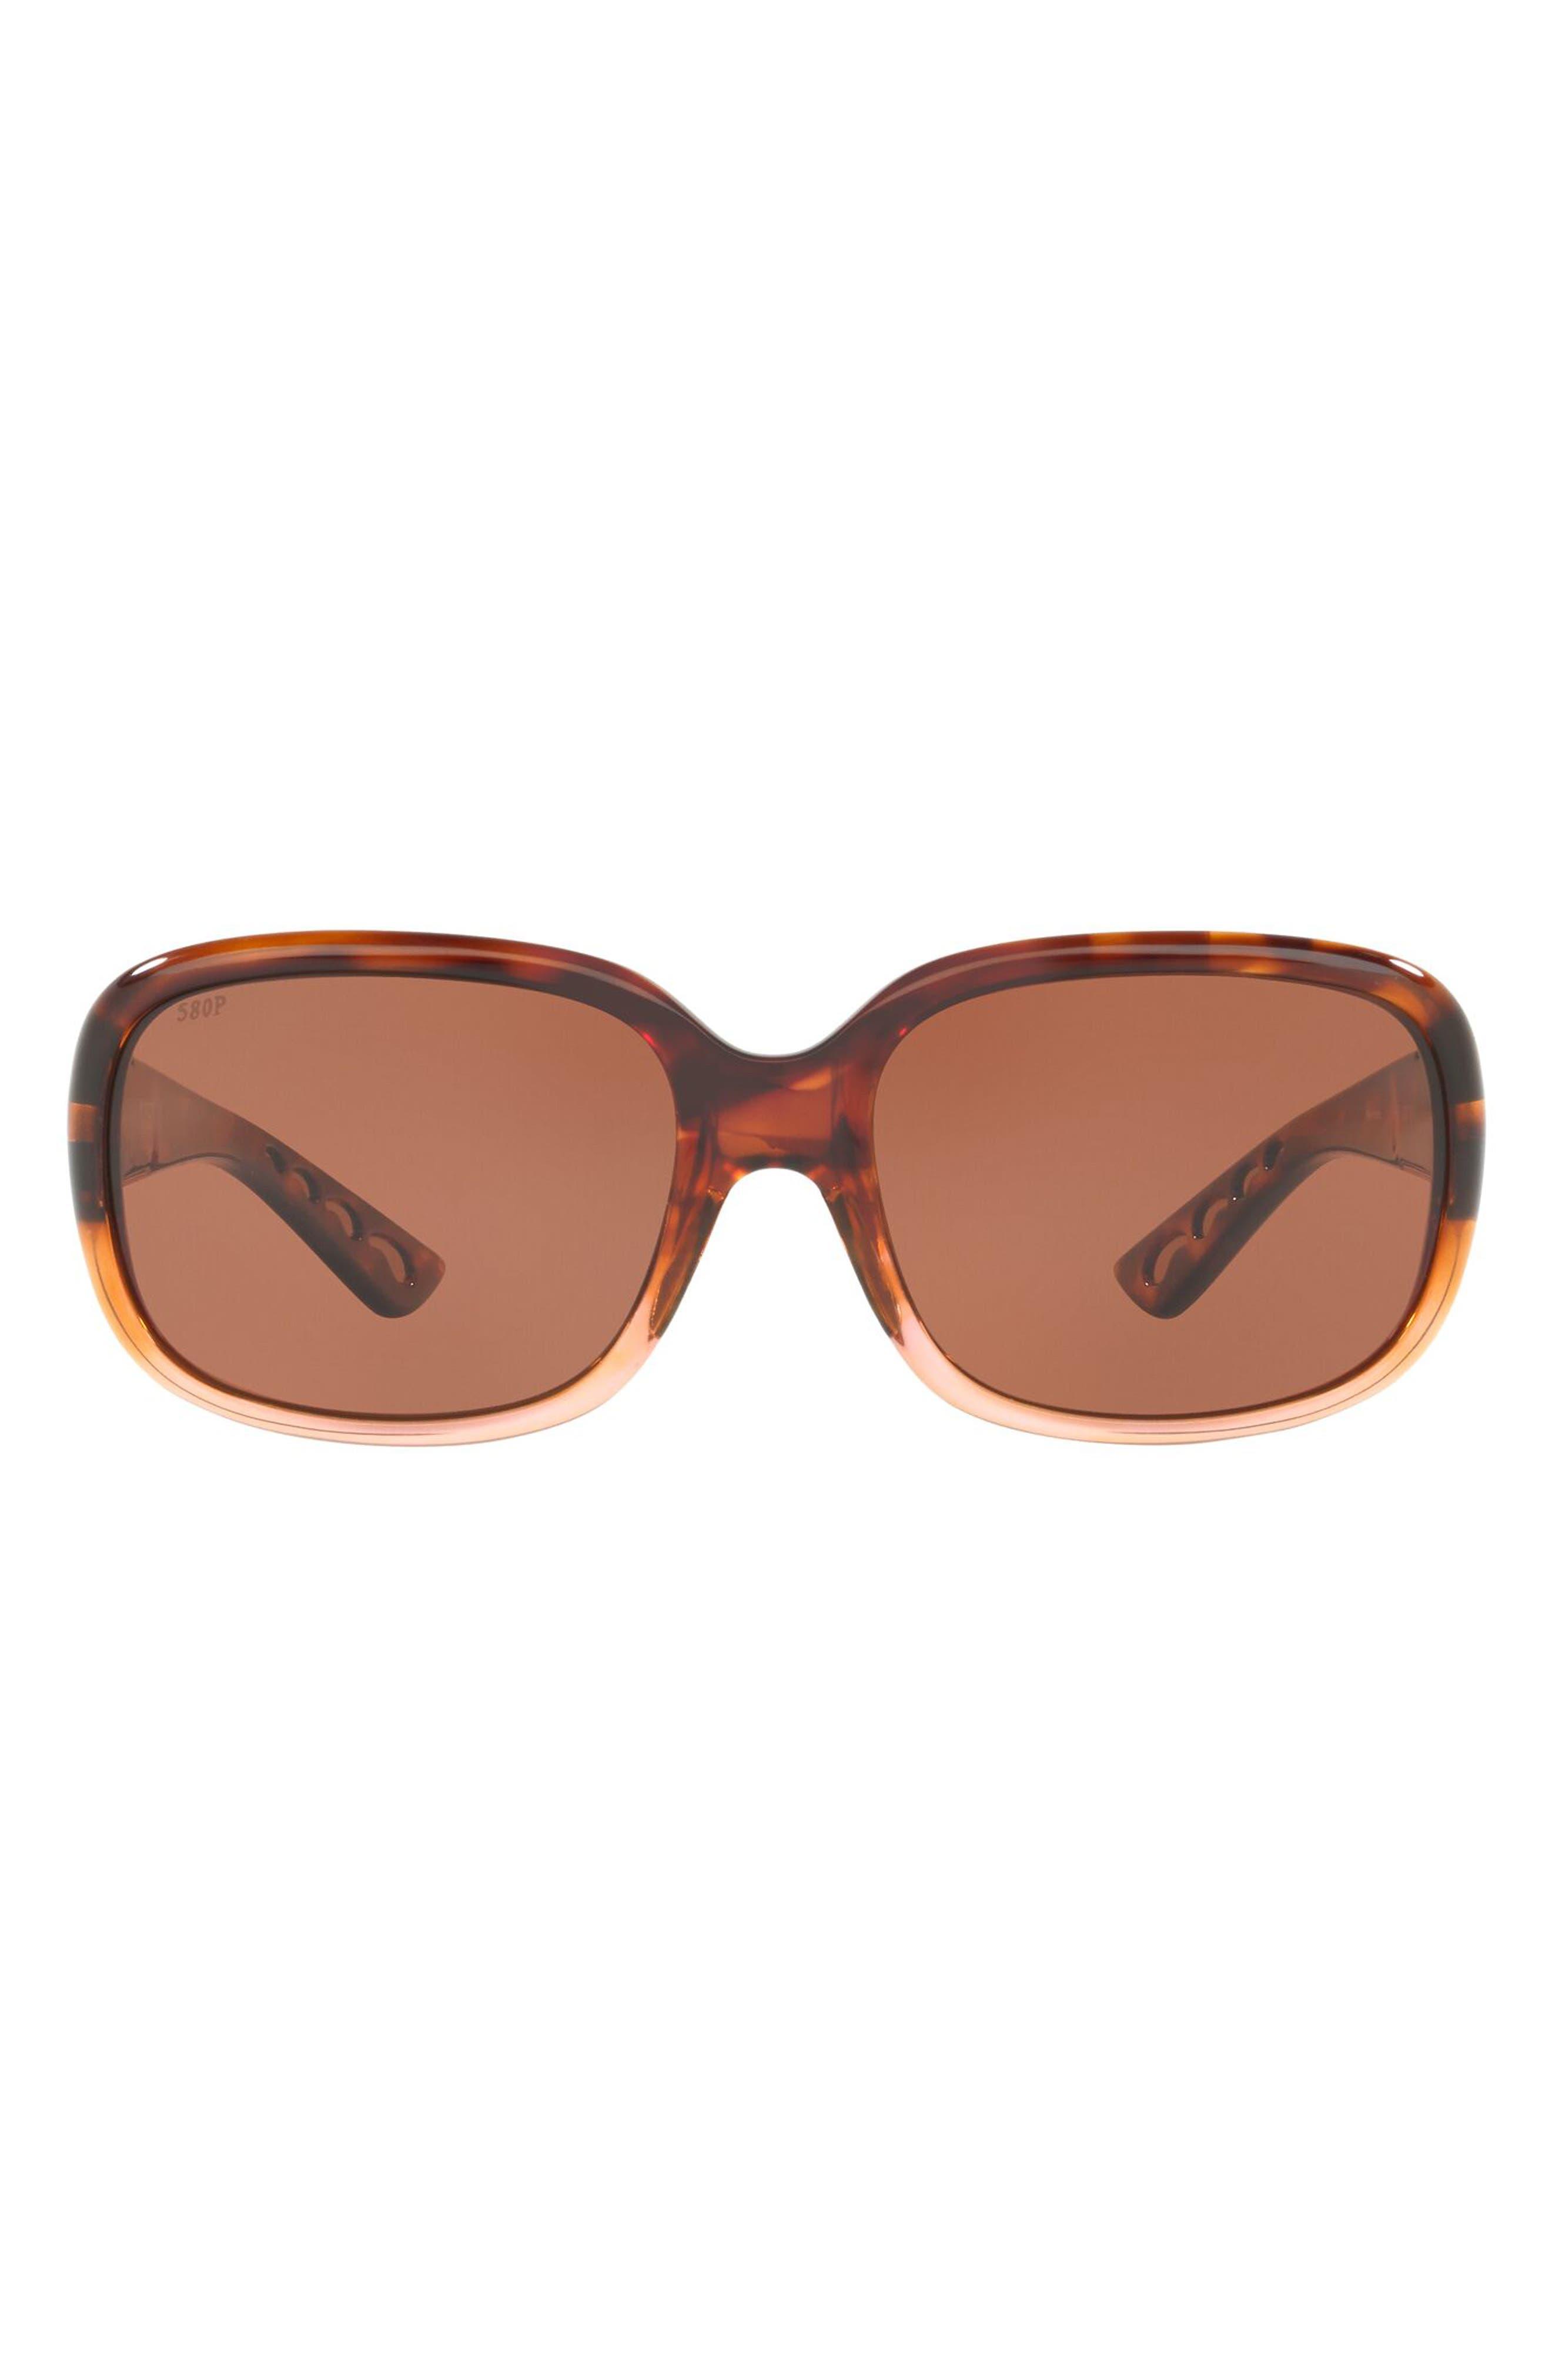 Gannet 58mm Polarized Oval Sunglasses